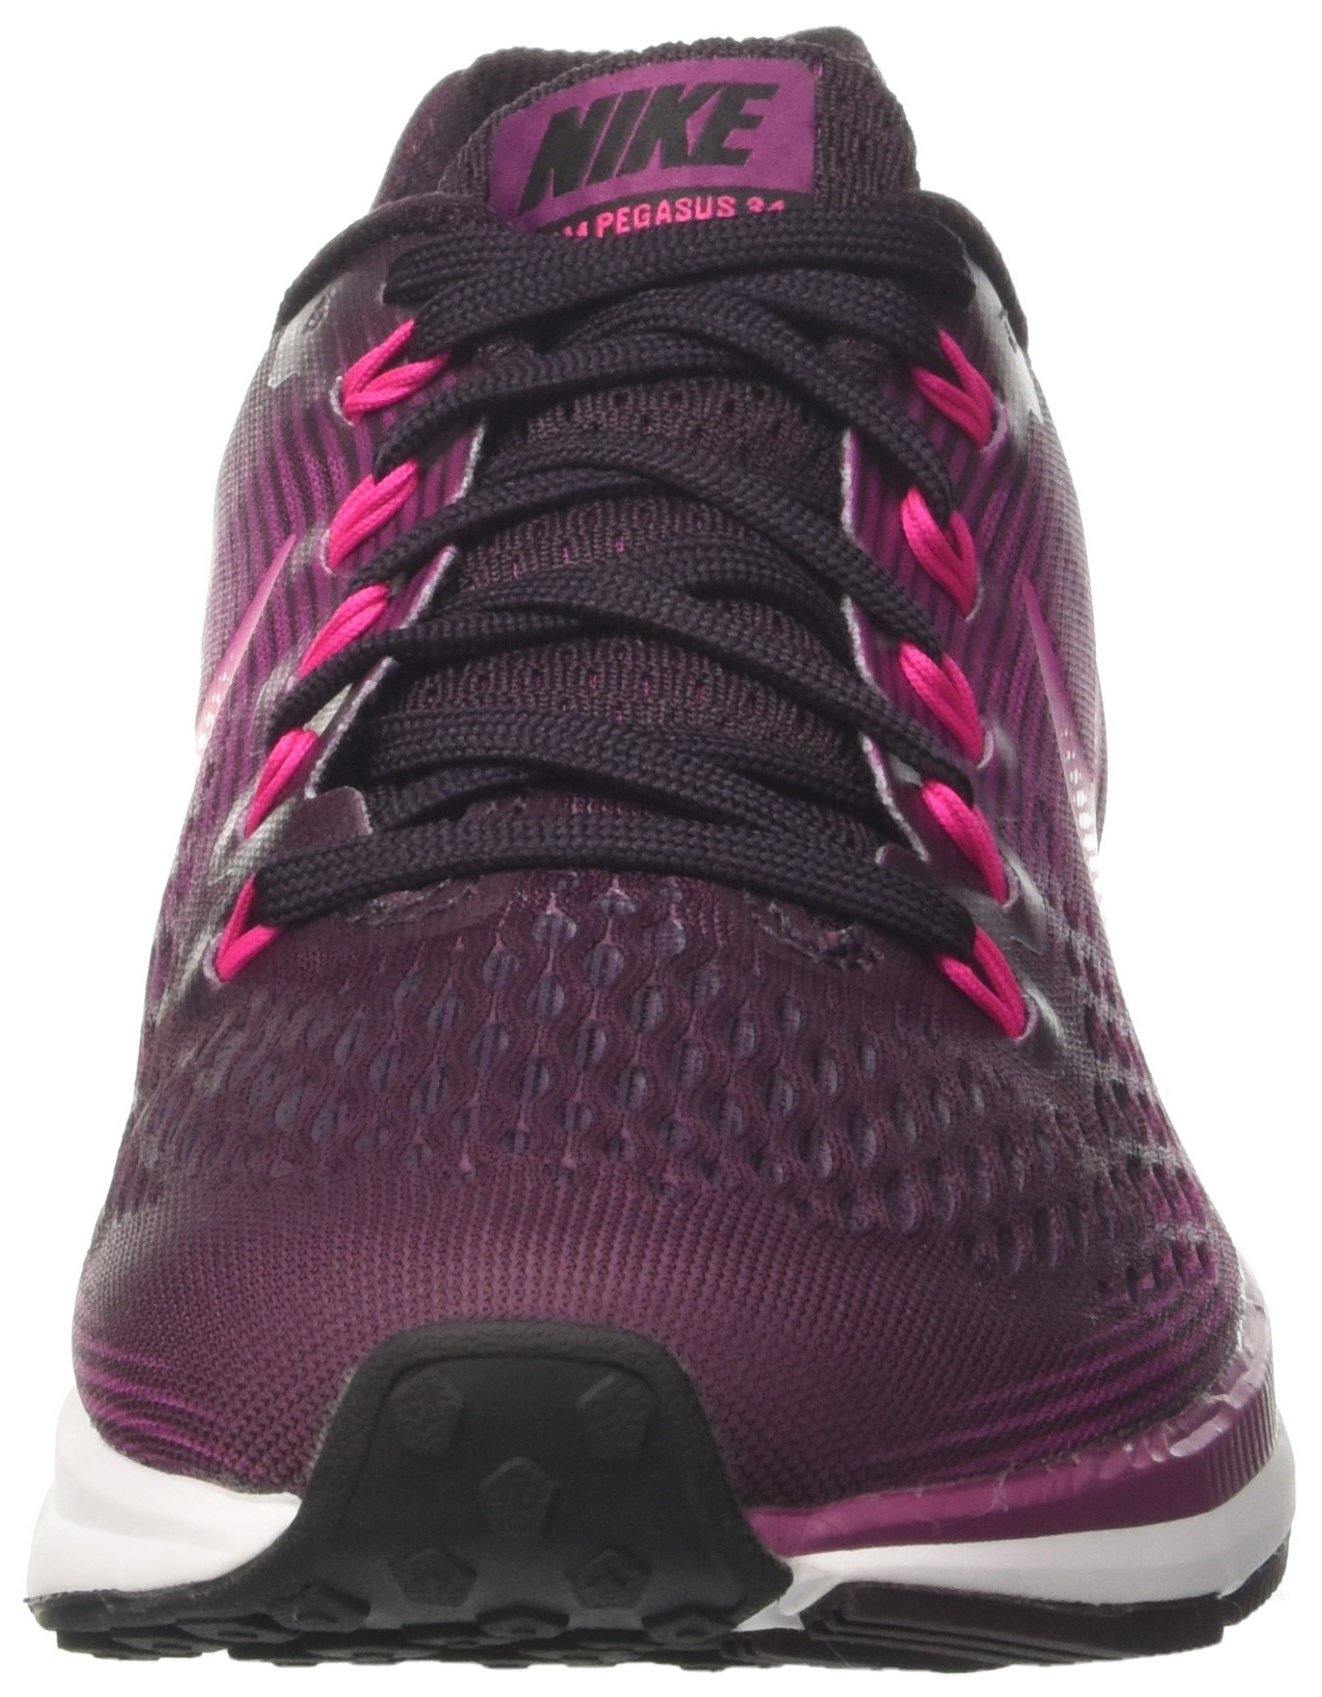 NIKE Women's Air Zoom Pegasus 34 Port Wine/Deadly Pink Running Shoe 7 Women US by NIKE (Image #4)